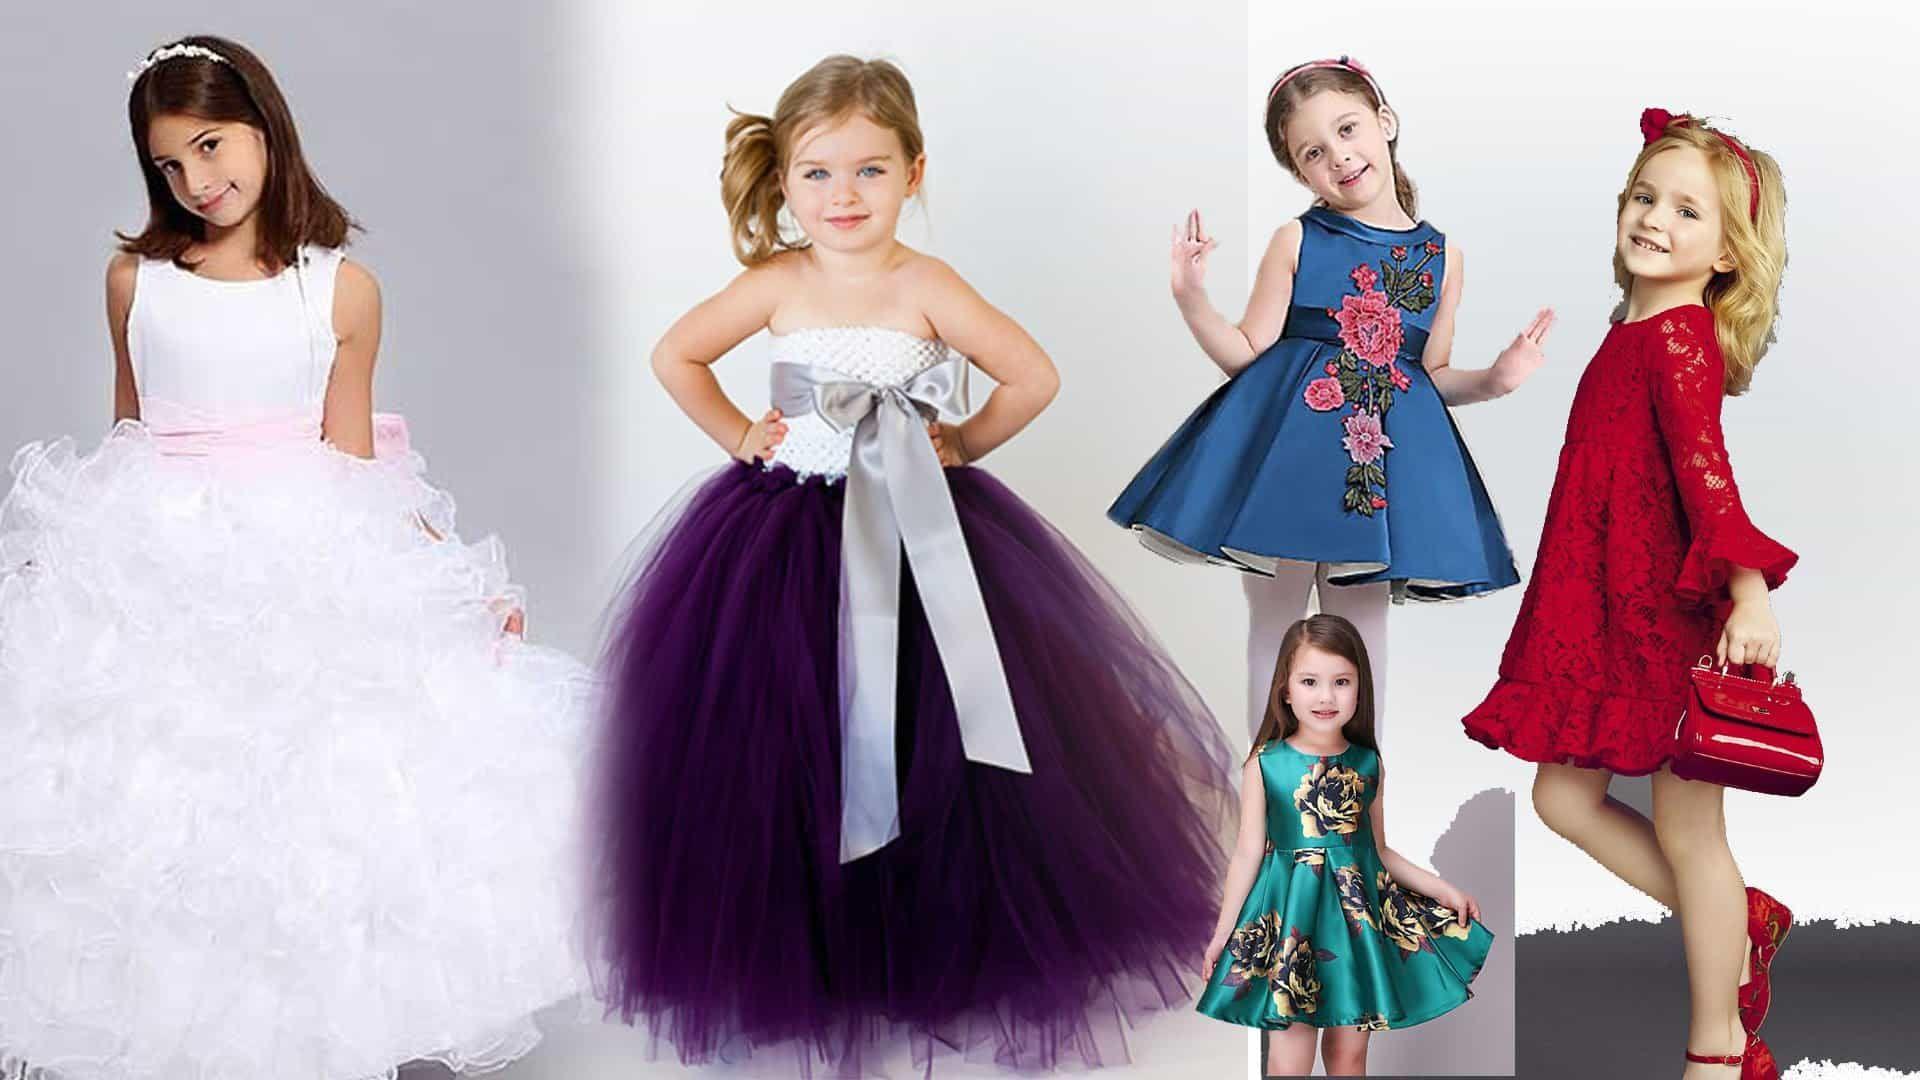 فساتين ملابس للعيد 2020 للبنات الكبار Flower Girl Dresses Wedding Dresses Dresses